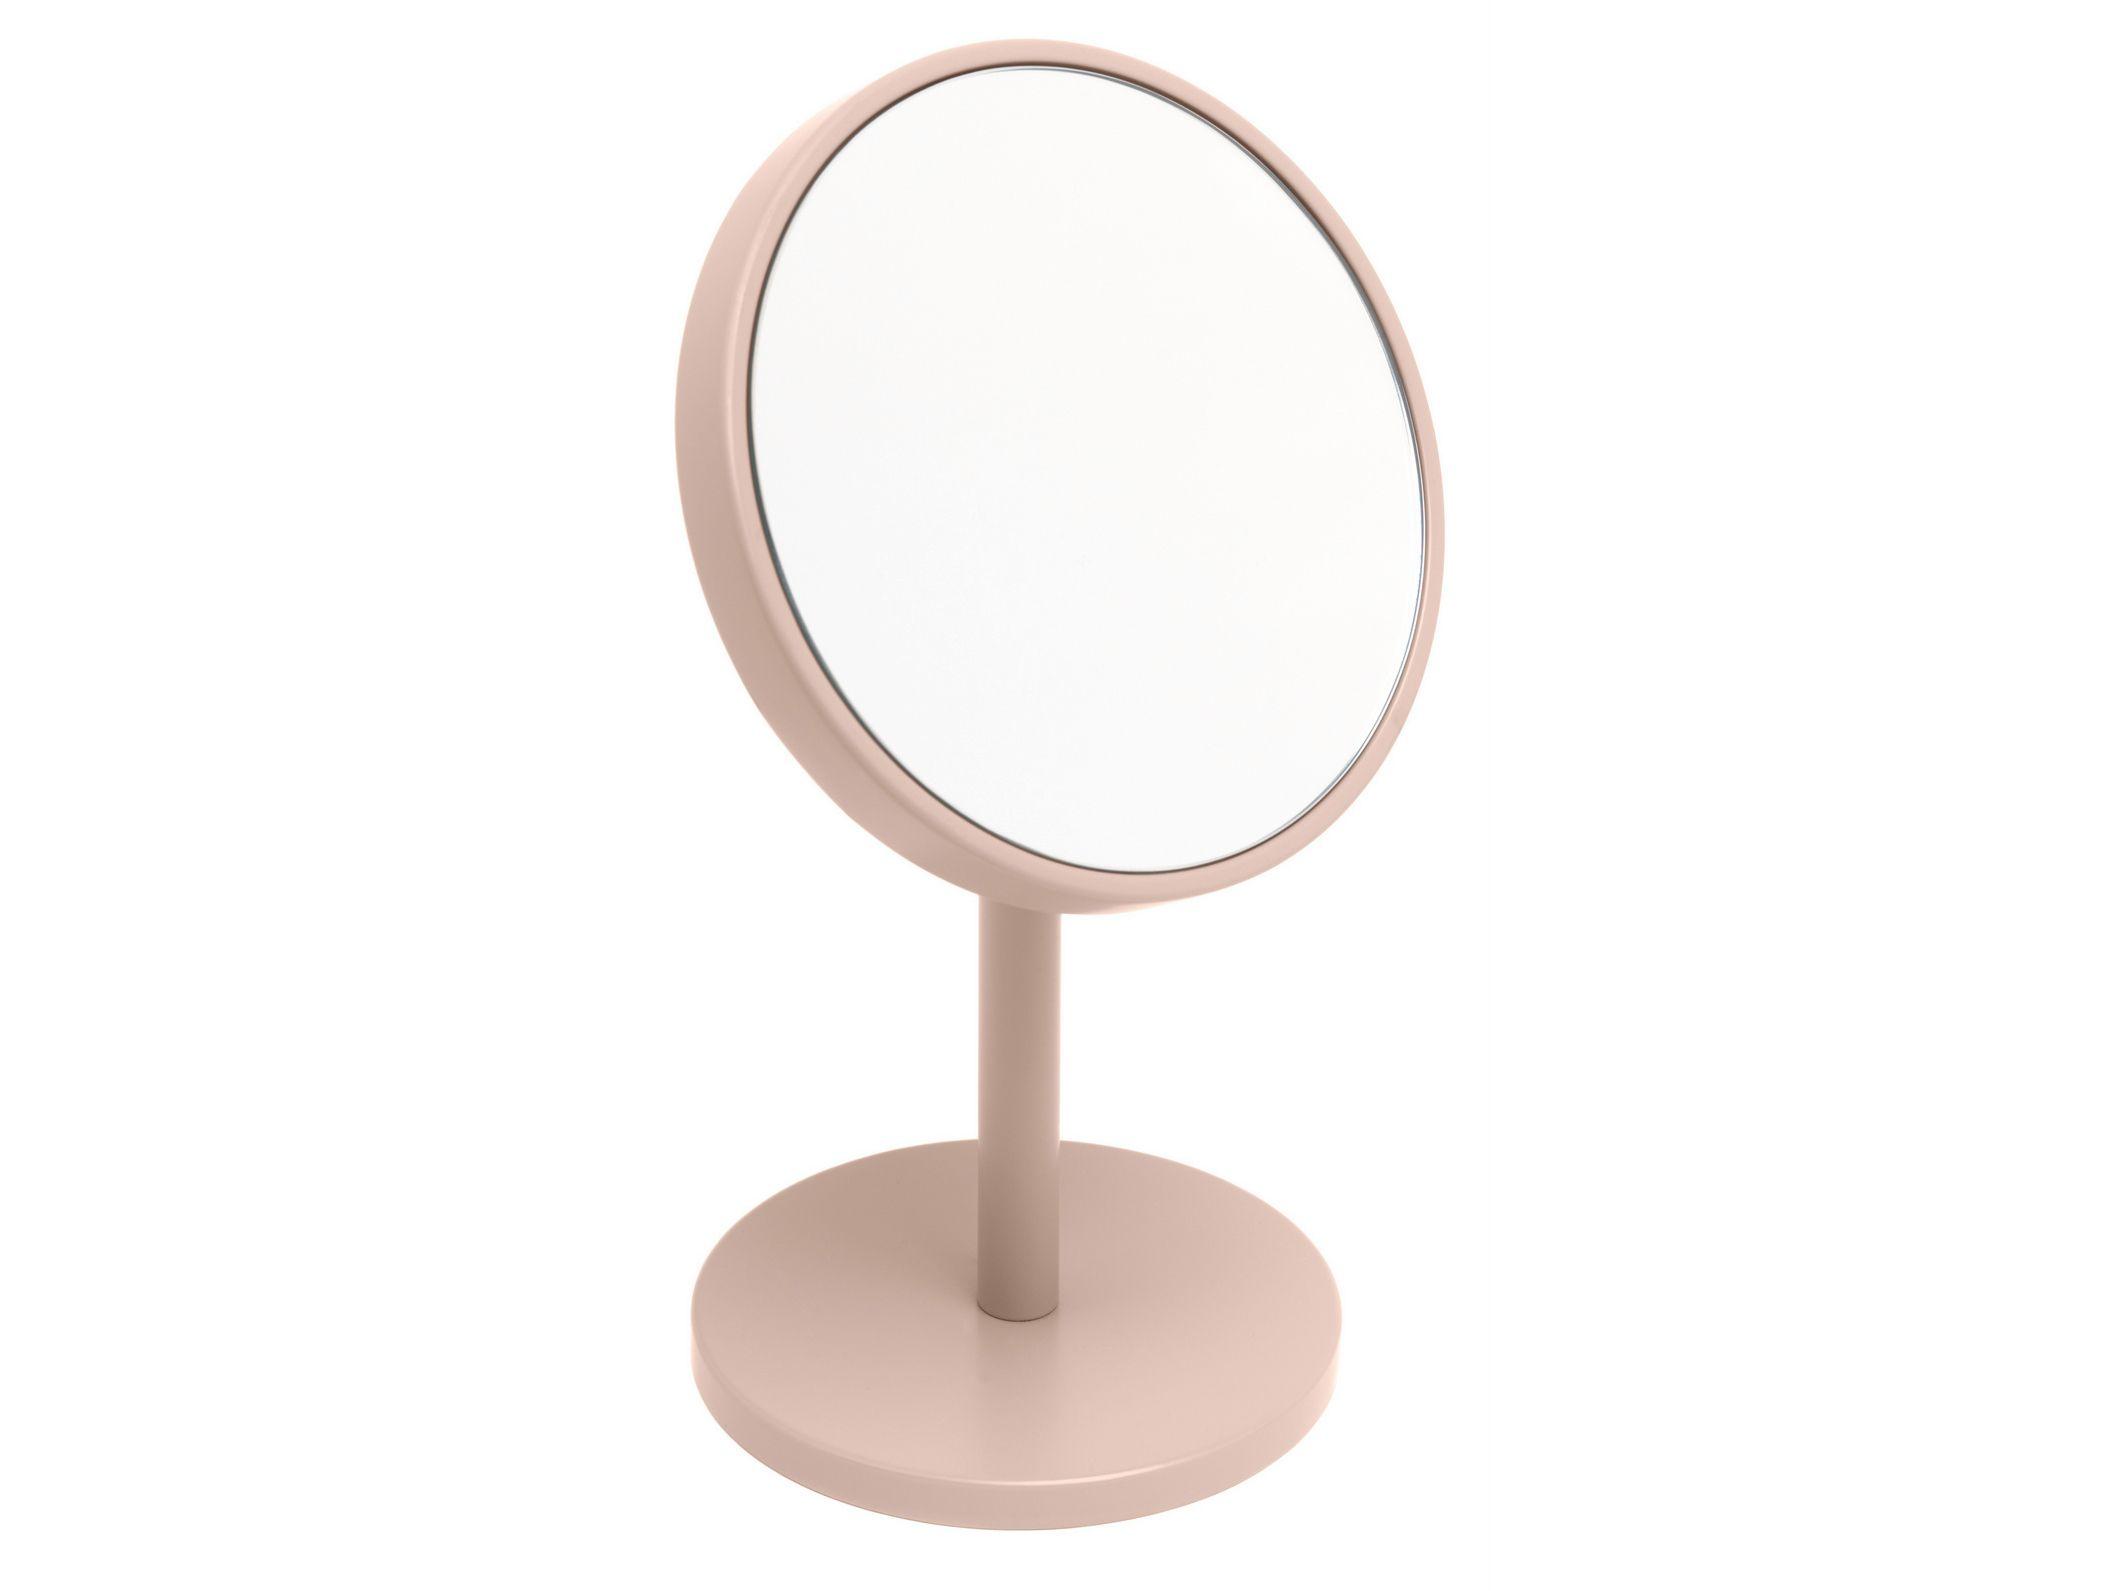 Miroir grossissant rond poser beauty by sch nbuch design for Miroir rond grossissant